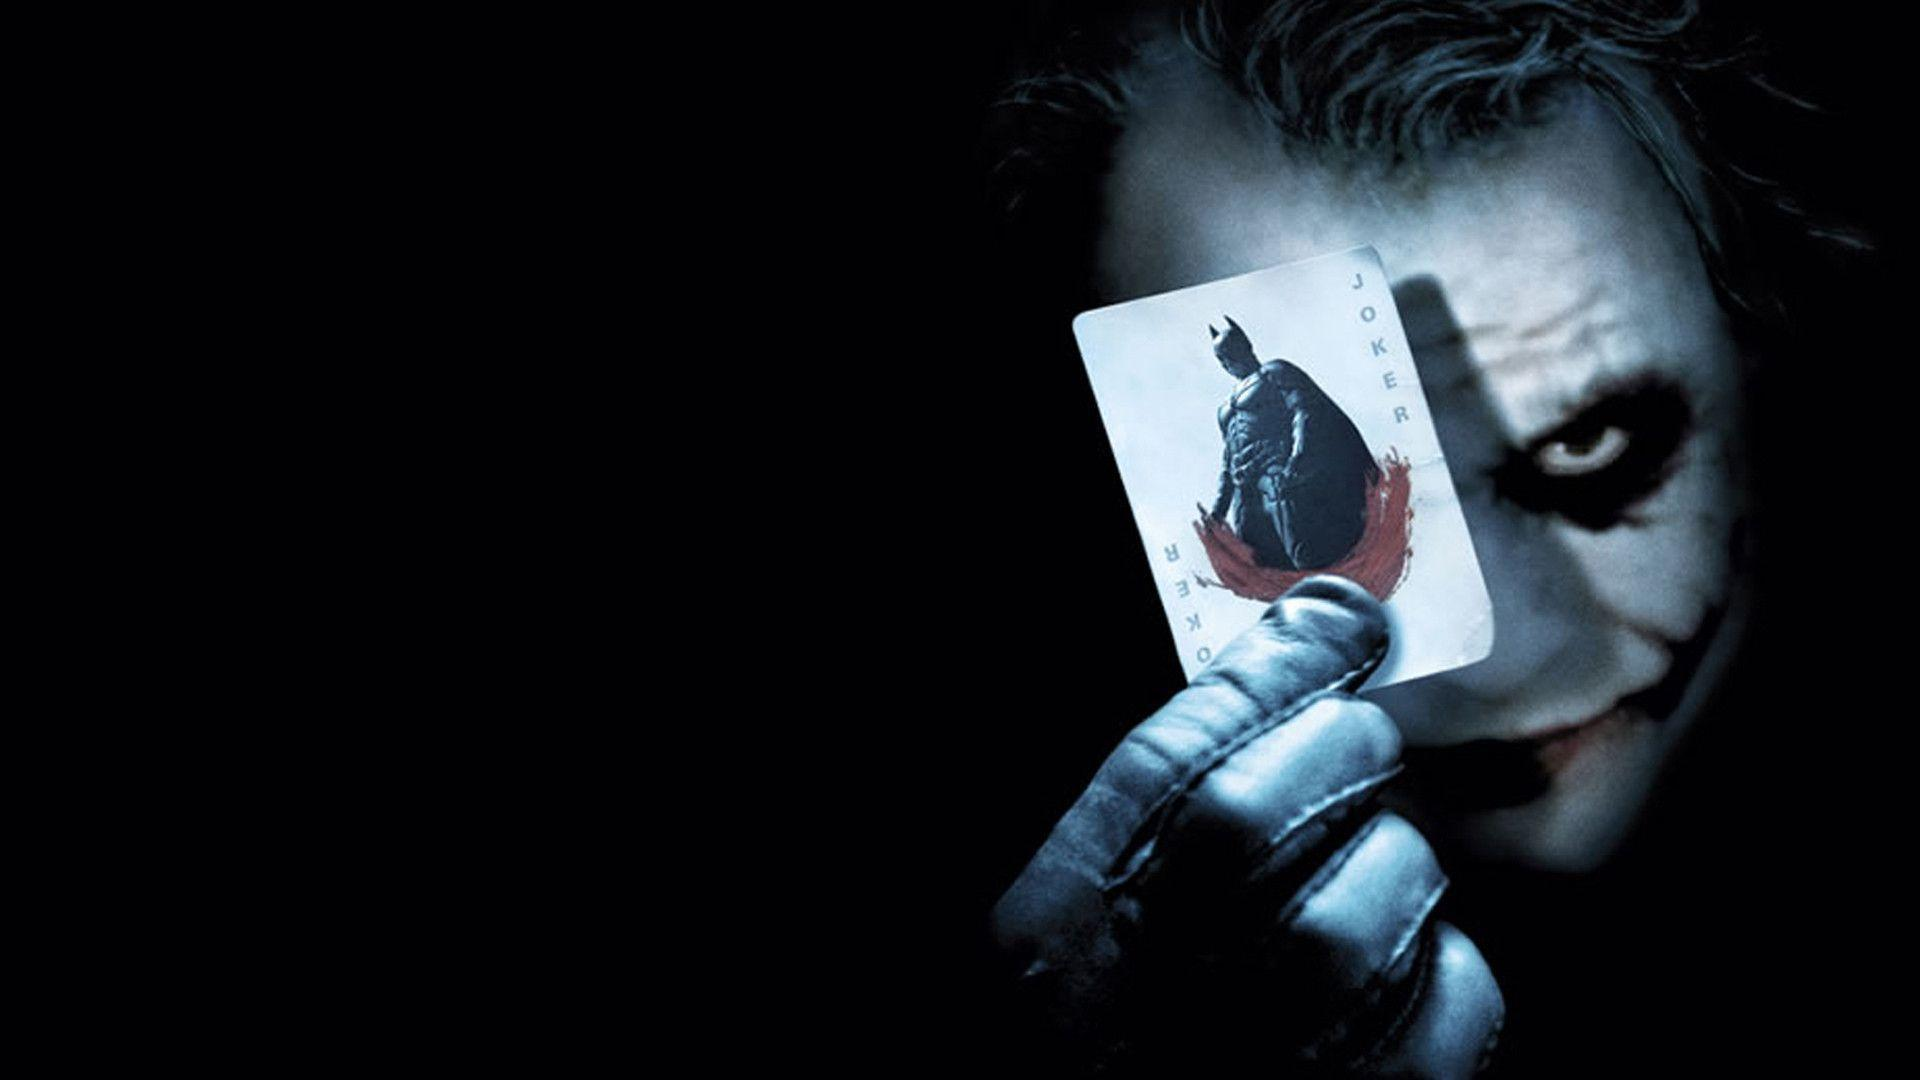 <b>Joker</b> HD <b>Wallpapers</b> 1080p - WallpaperSafari